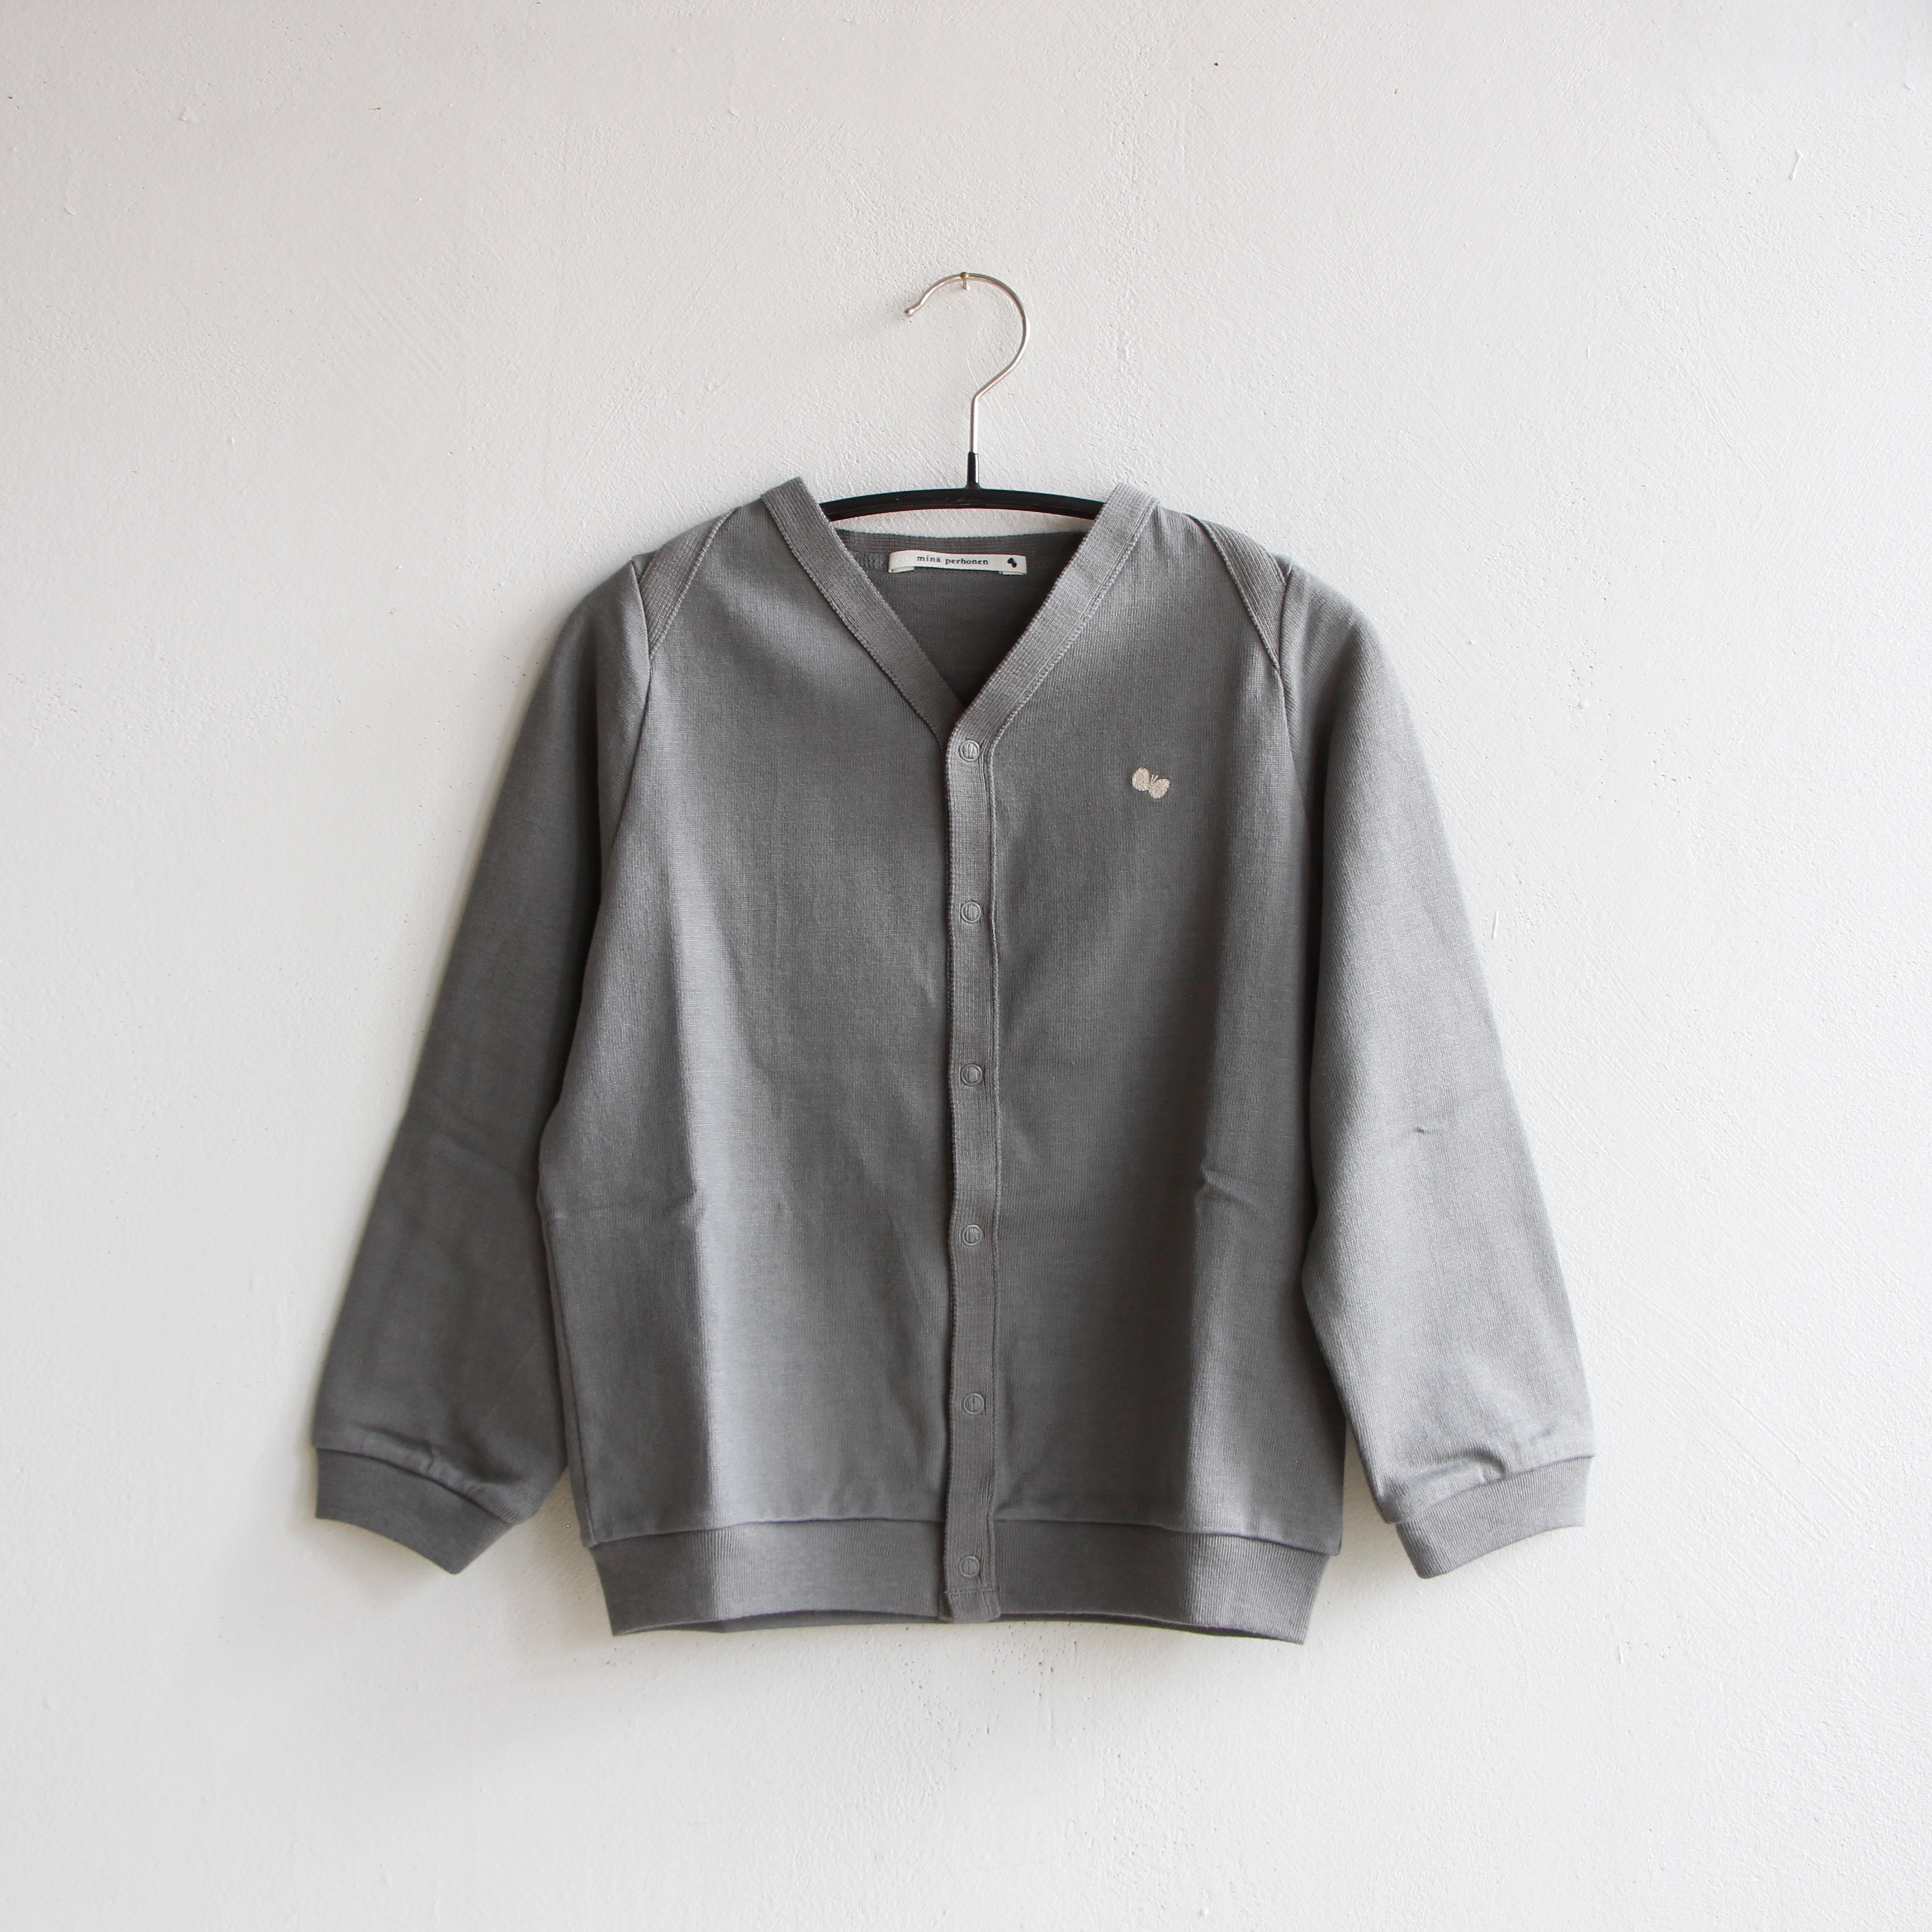 《mina perhonen 2020AW》zutto カーディガン / gray / 110cm